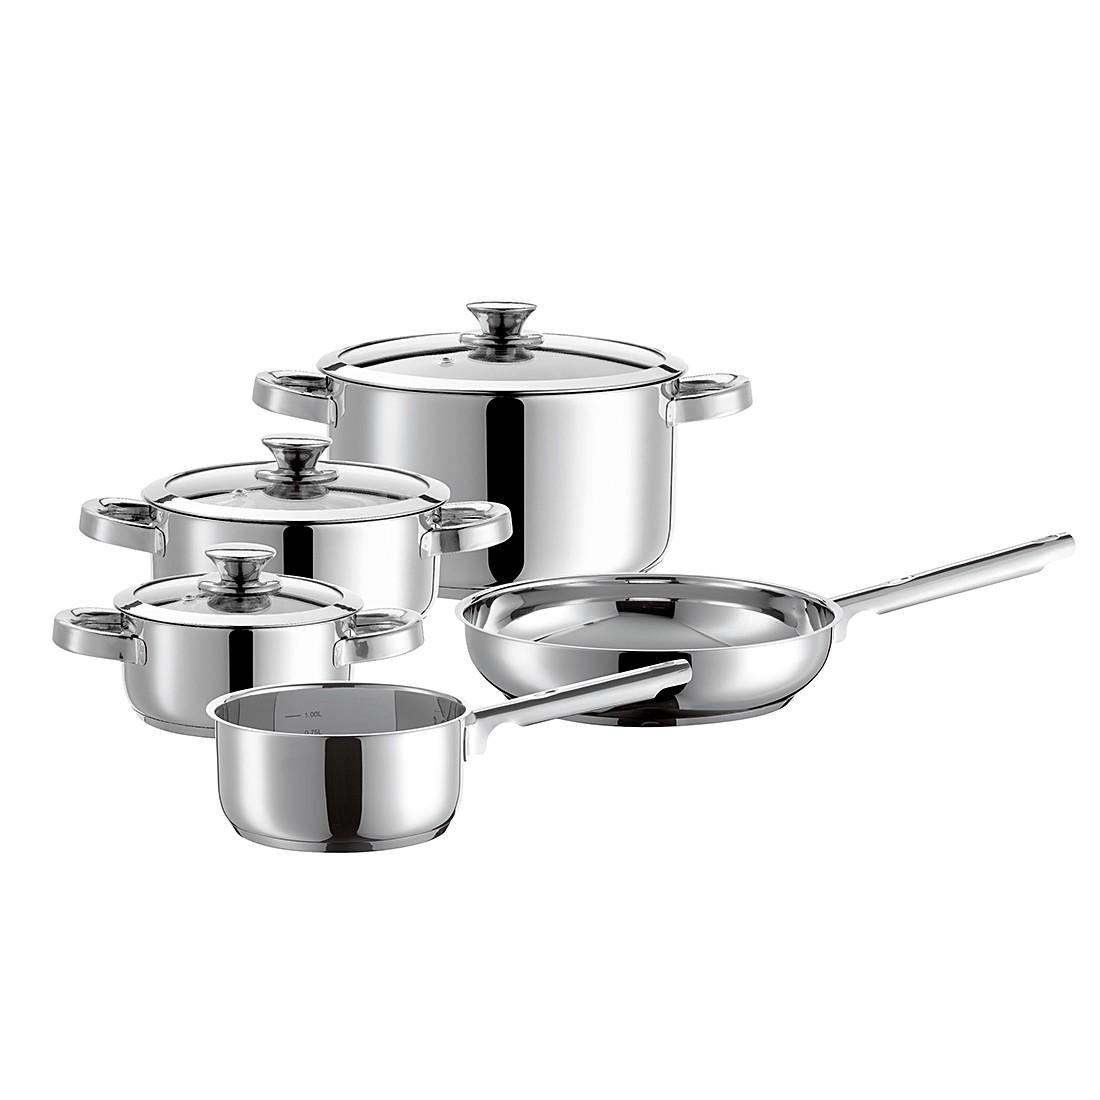 Kochgeschirr- Set (8- teilig) Varuna, Mäser günstig online kaufen